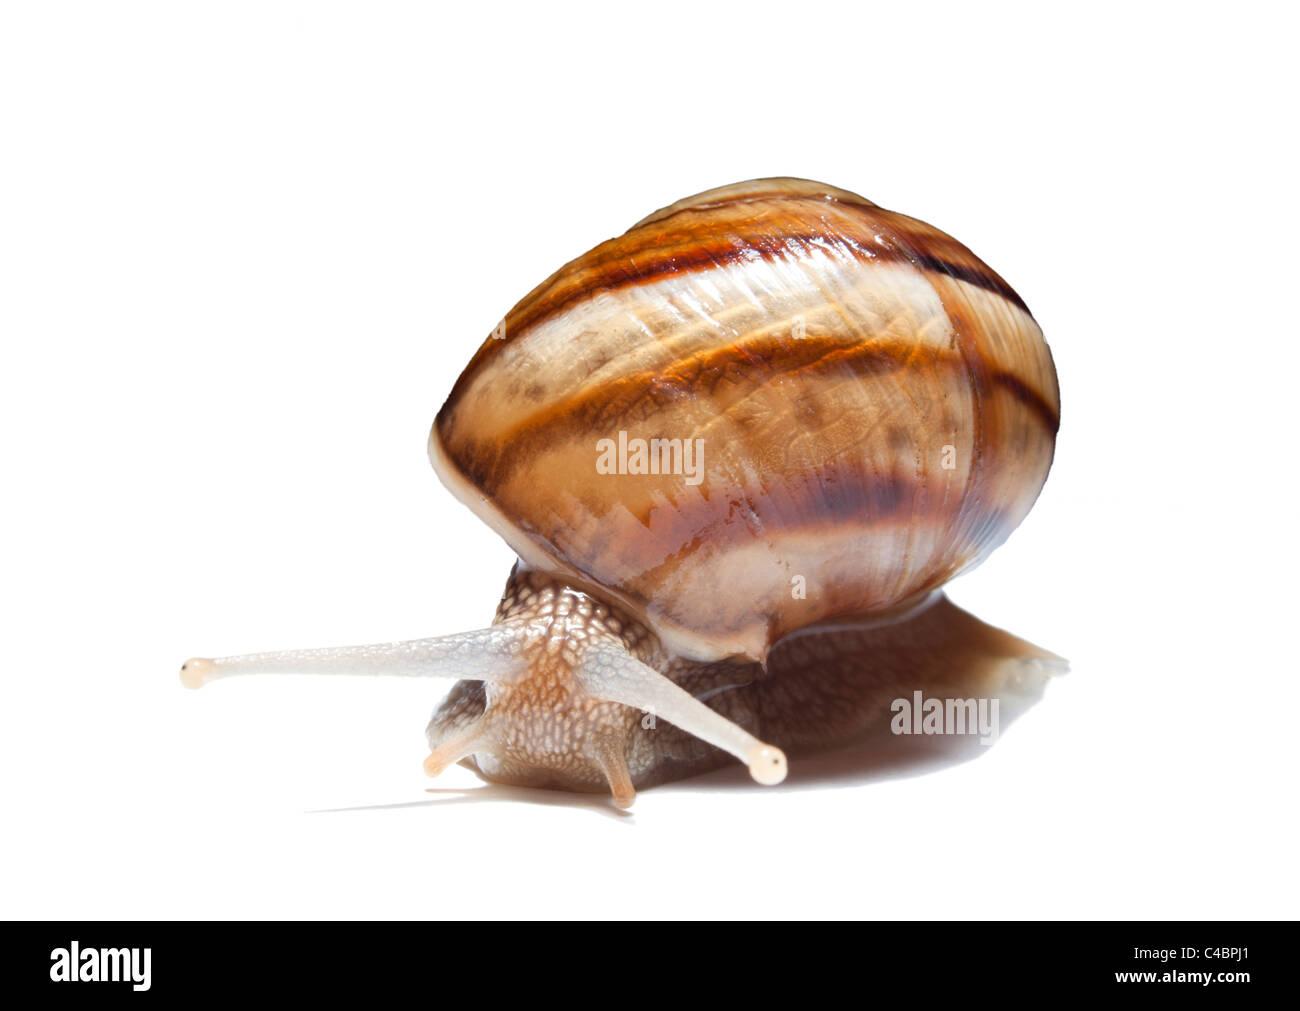 snail on white background - Stock Image